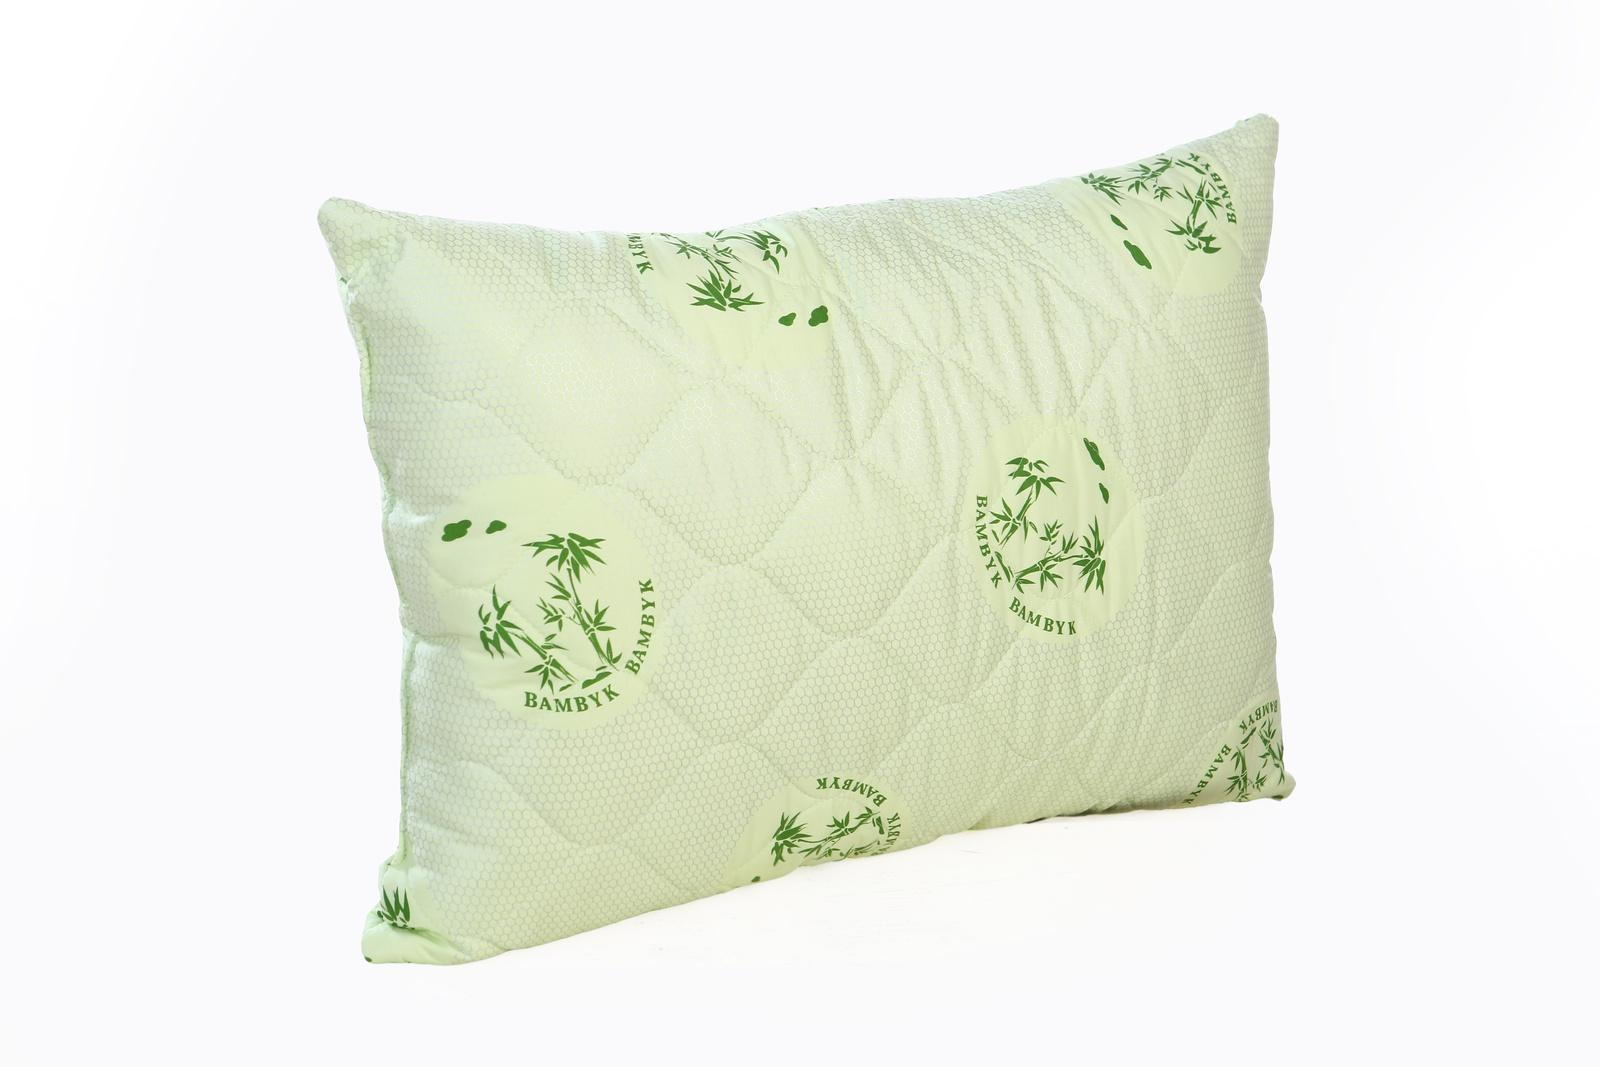 цена Подушка Спаленка Подушка Бамбук, П-Бамбук-57/салатовый, зеленый онлайн в 2017 году